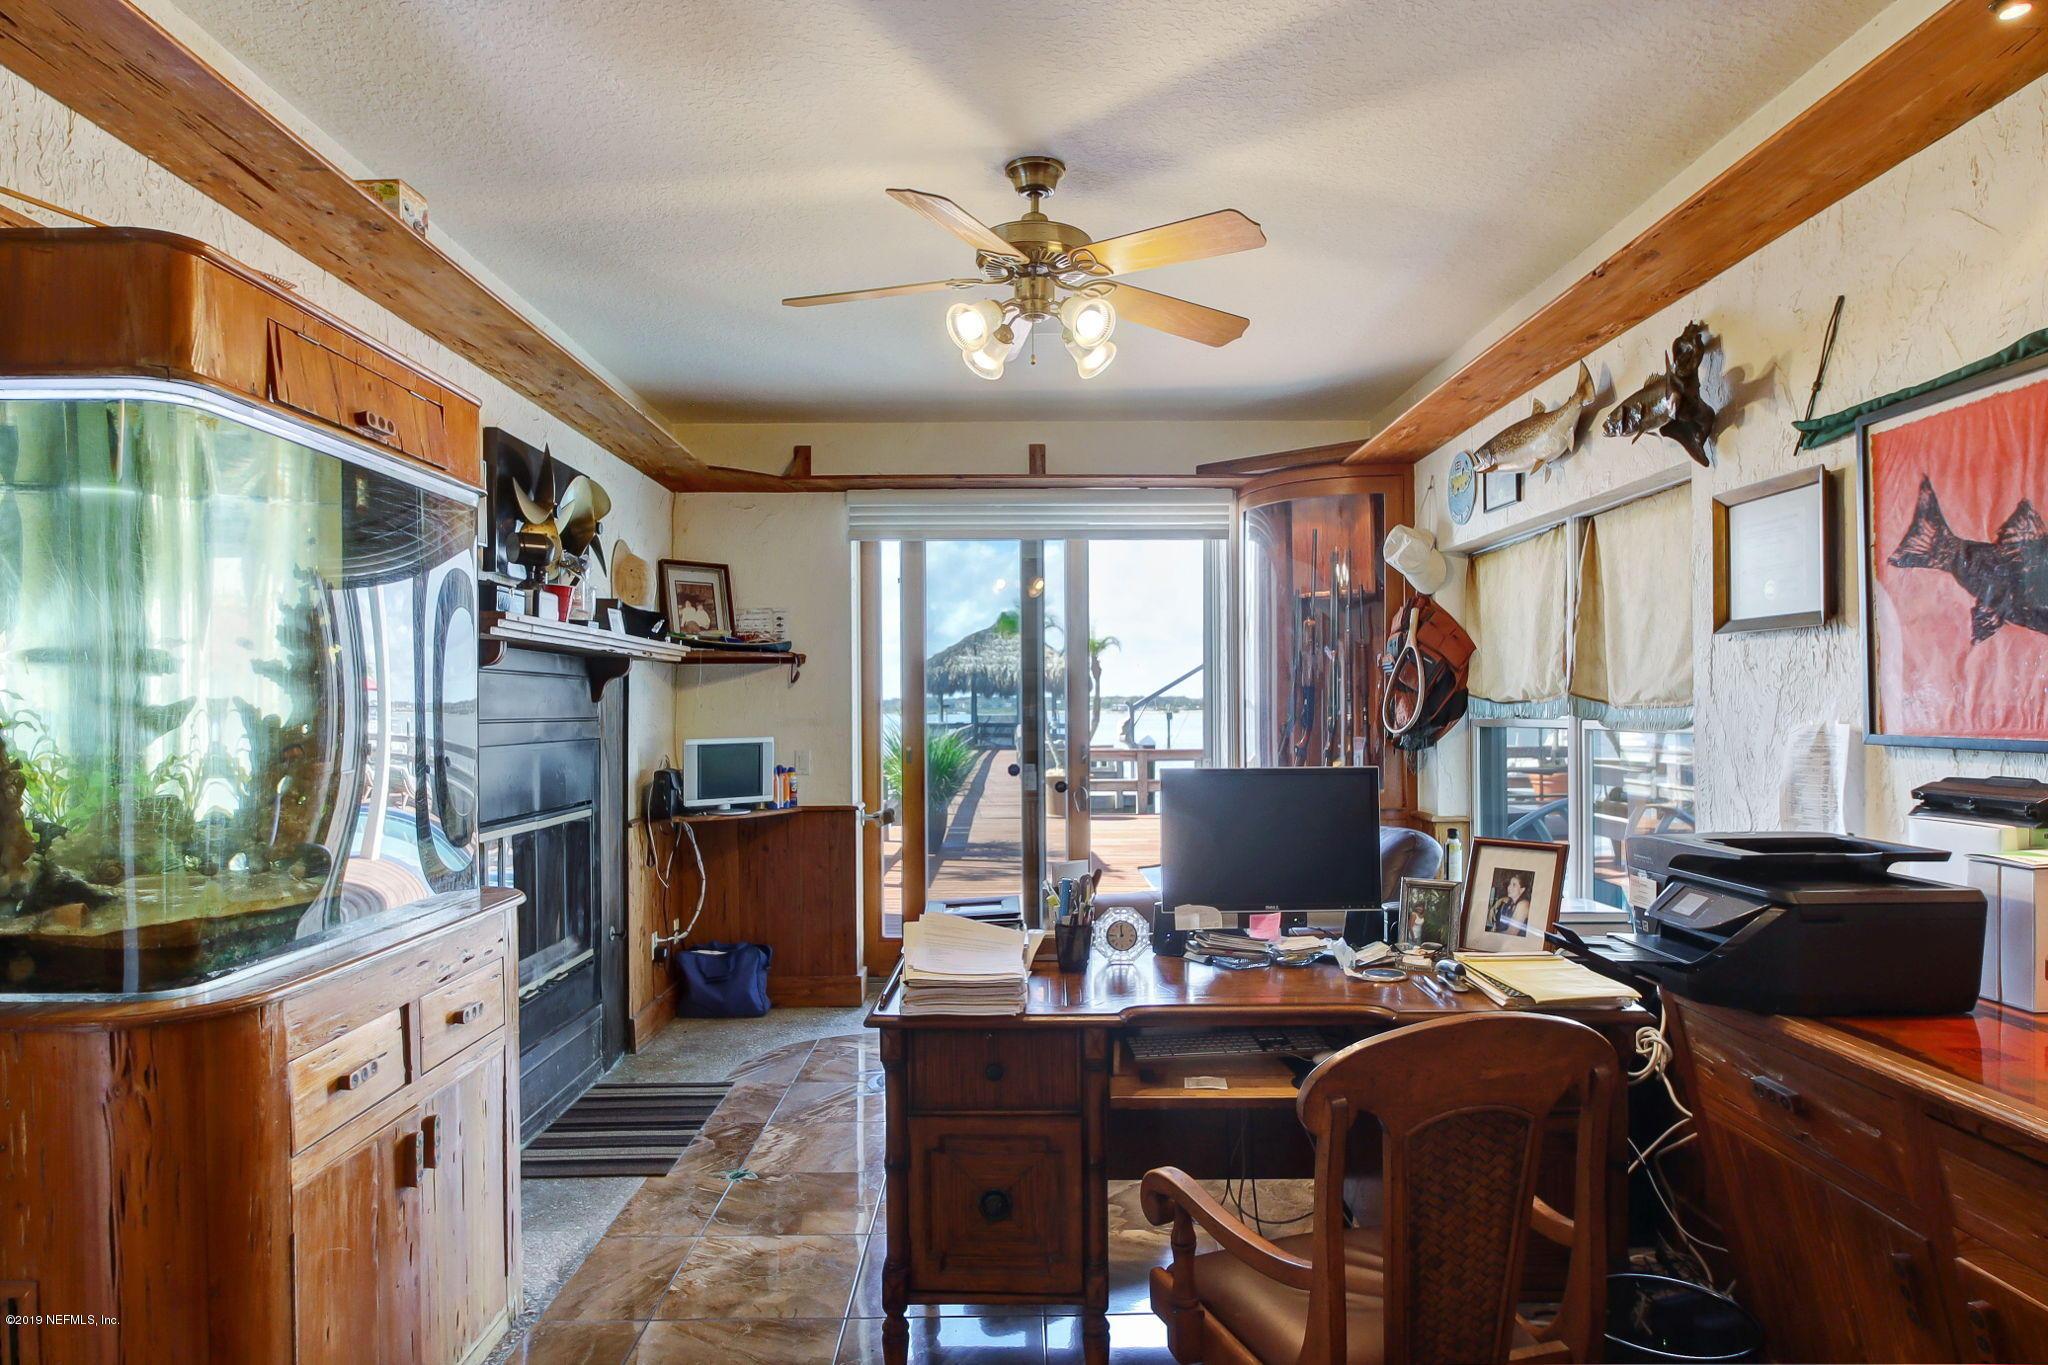 2721 HARBOR, ST AUGUSTINE, FLORIDA 32084, 5 Bedrooms Bedrooms, ,6 BathroomsBathrooms,Residential,For sale,HARBOR,1024699